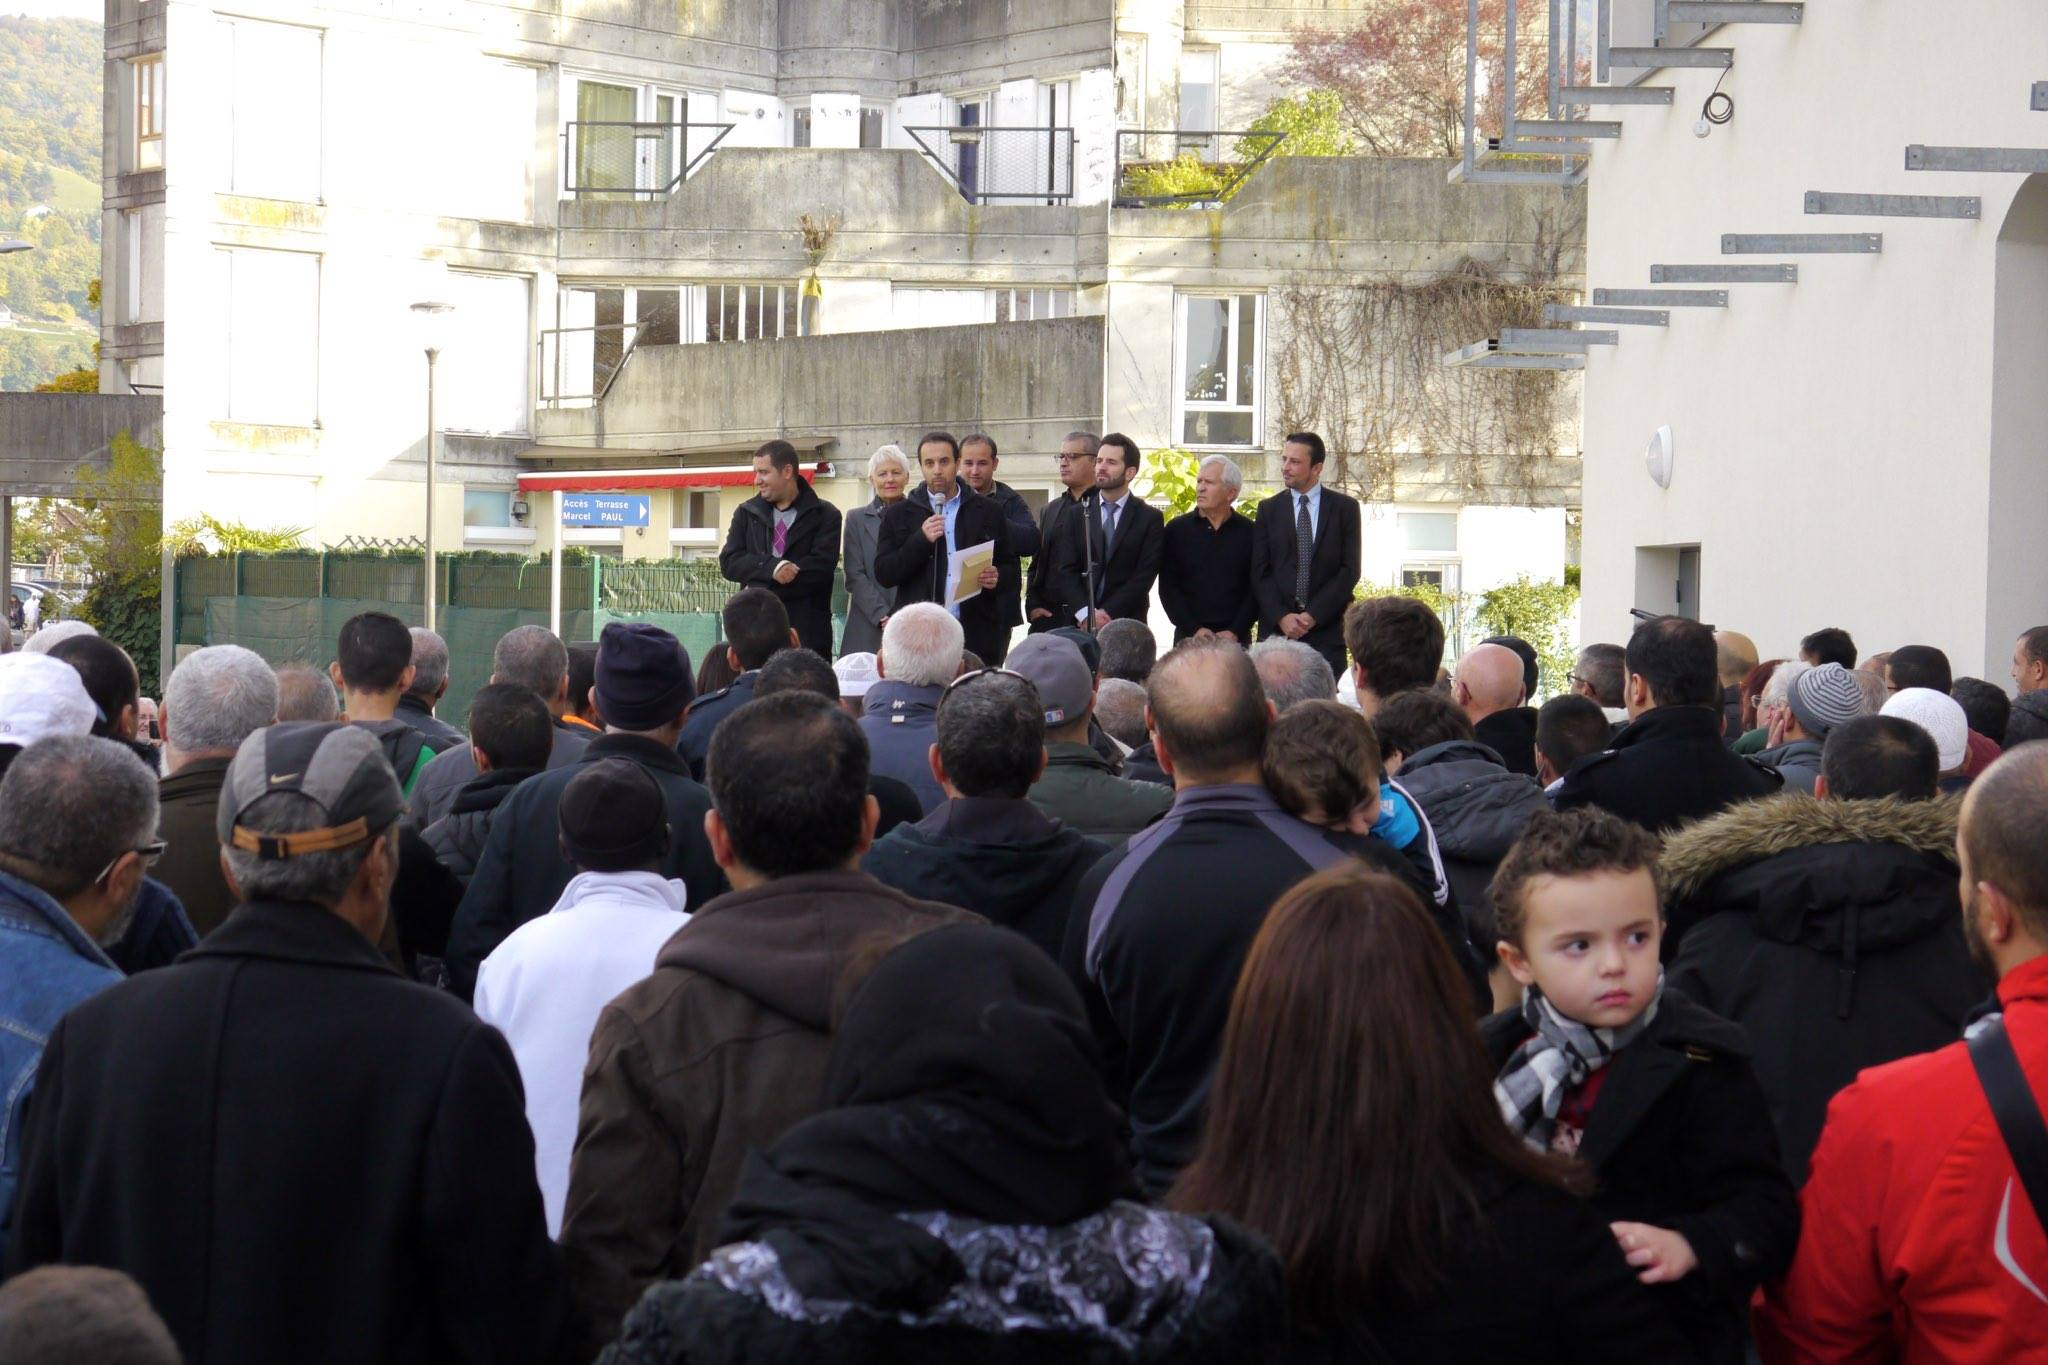 Inauguration de la mosquée Omar de Saint-Martin-d'Hères 1